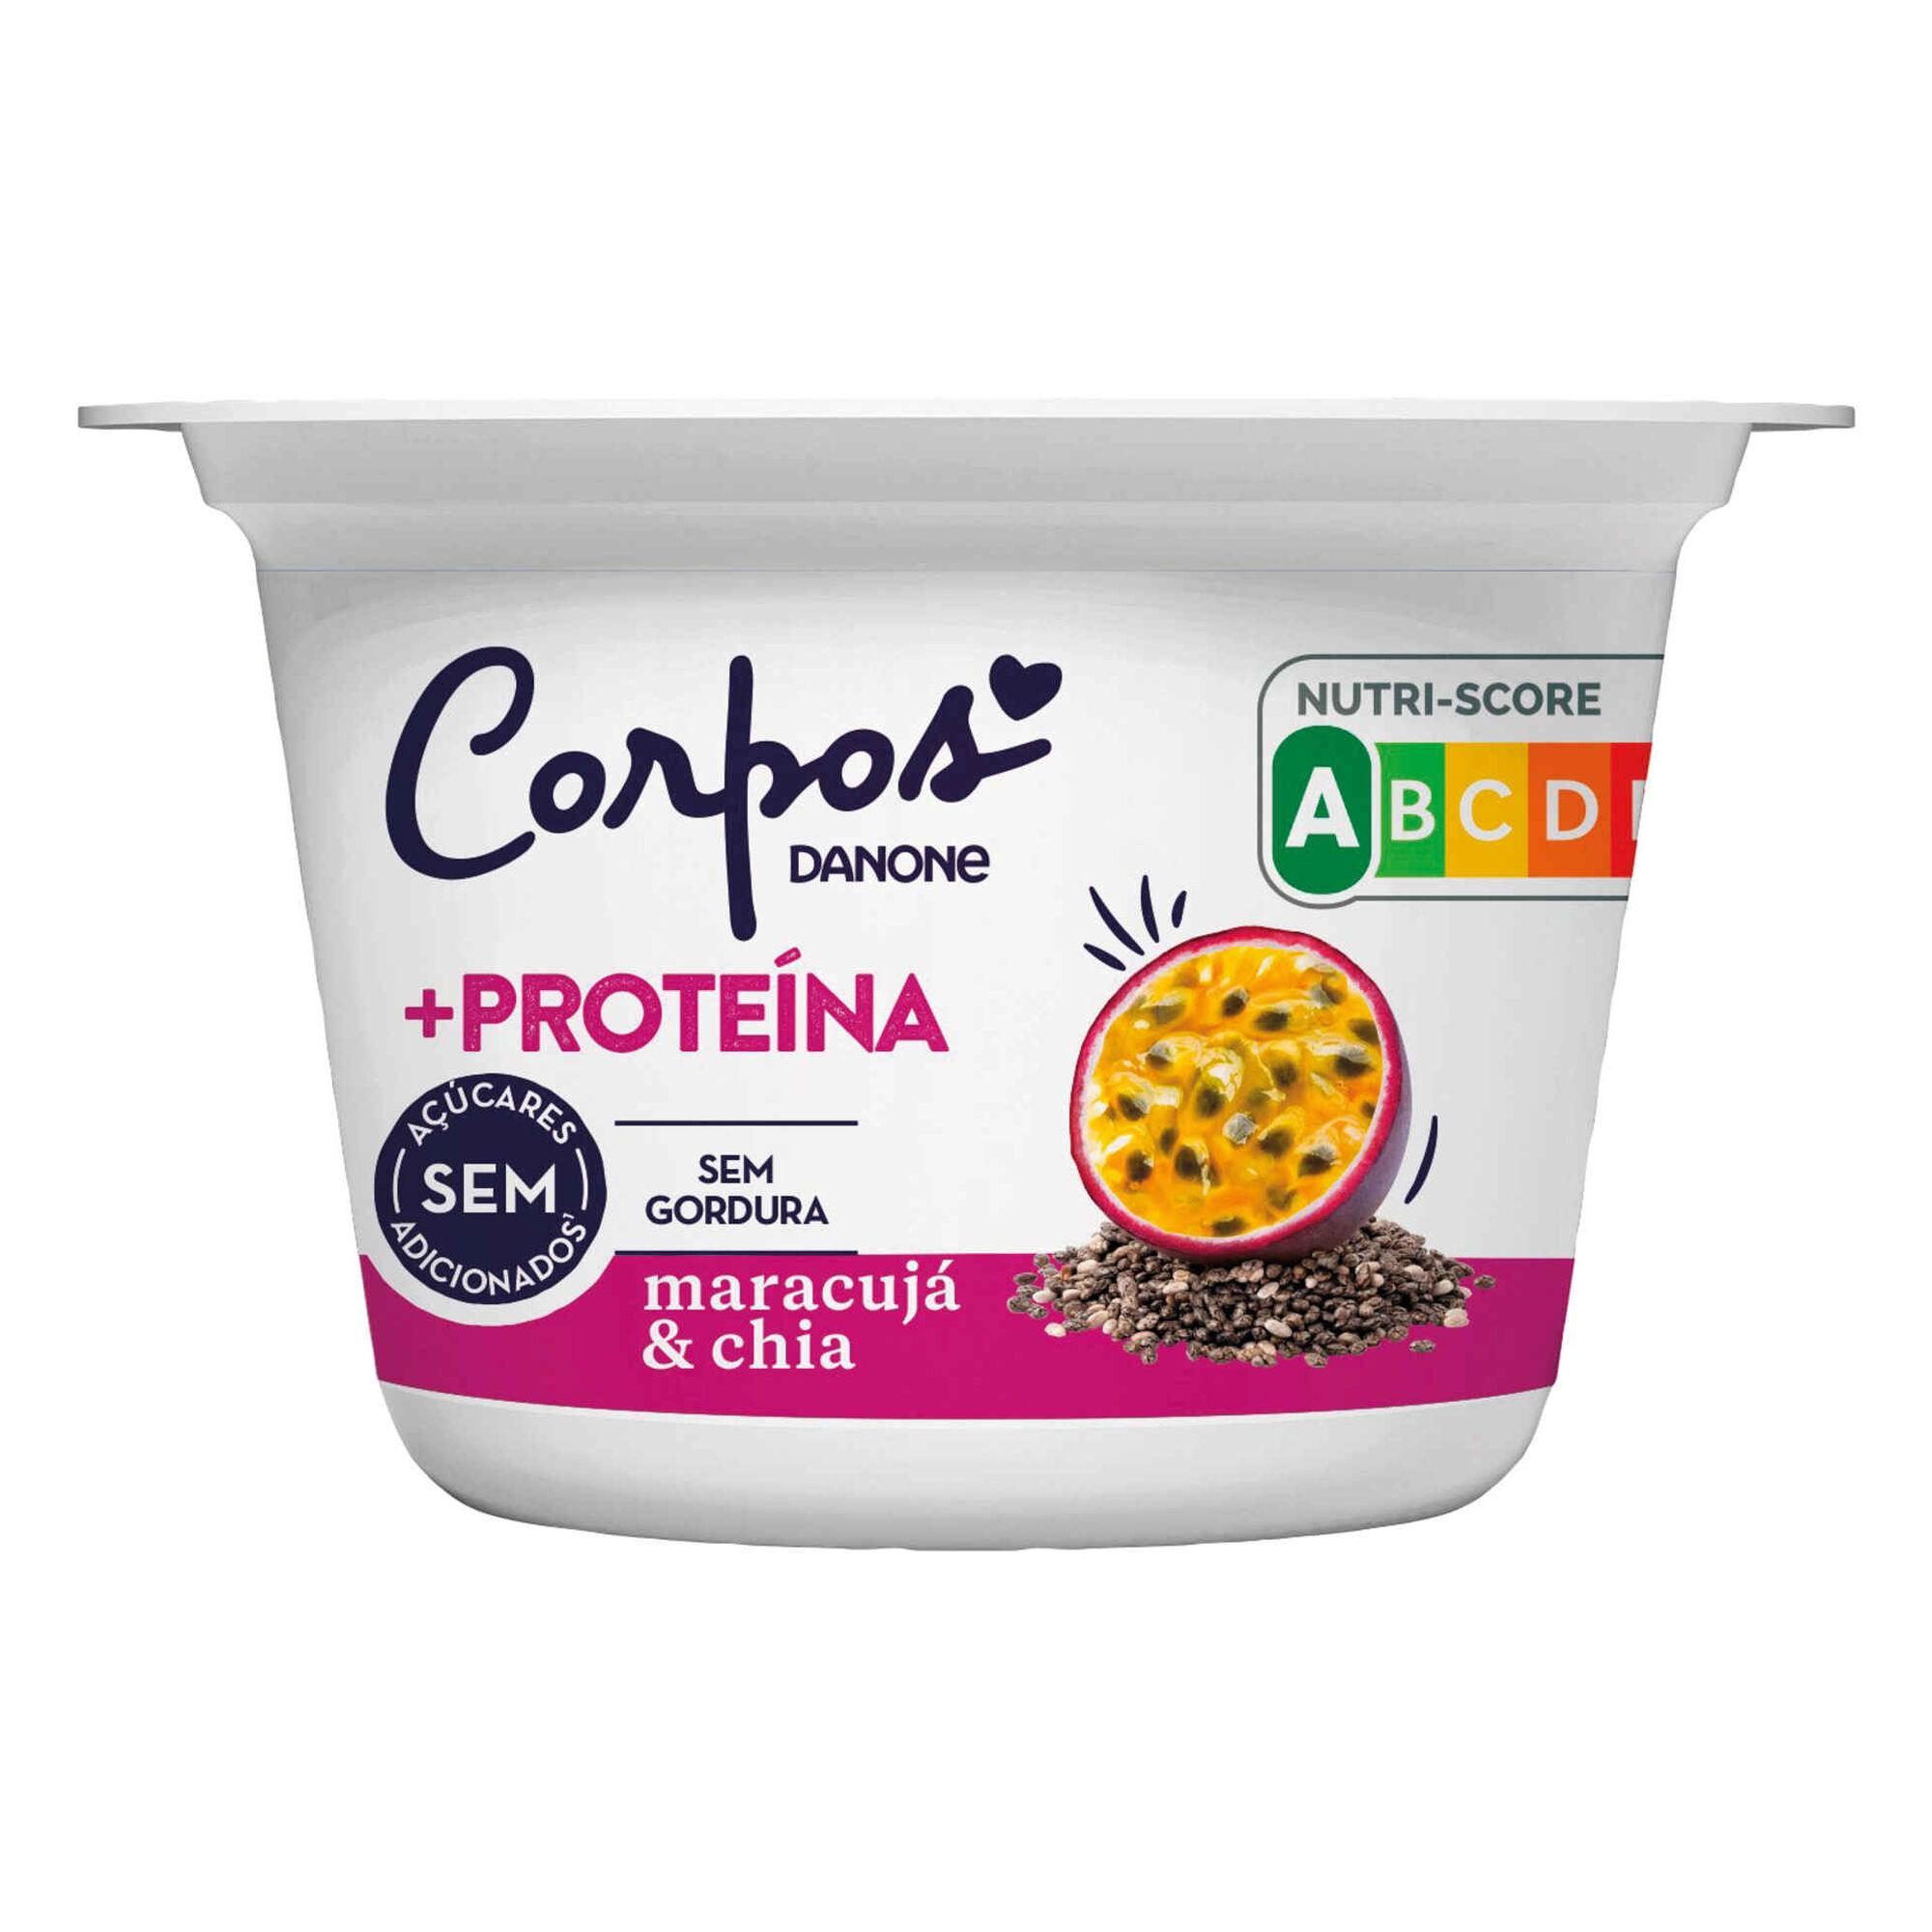 Iogurte +Proteína Sólido Maracujá e Chia Corpos Danone